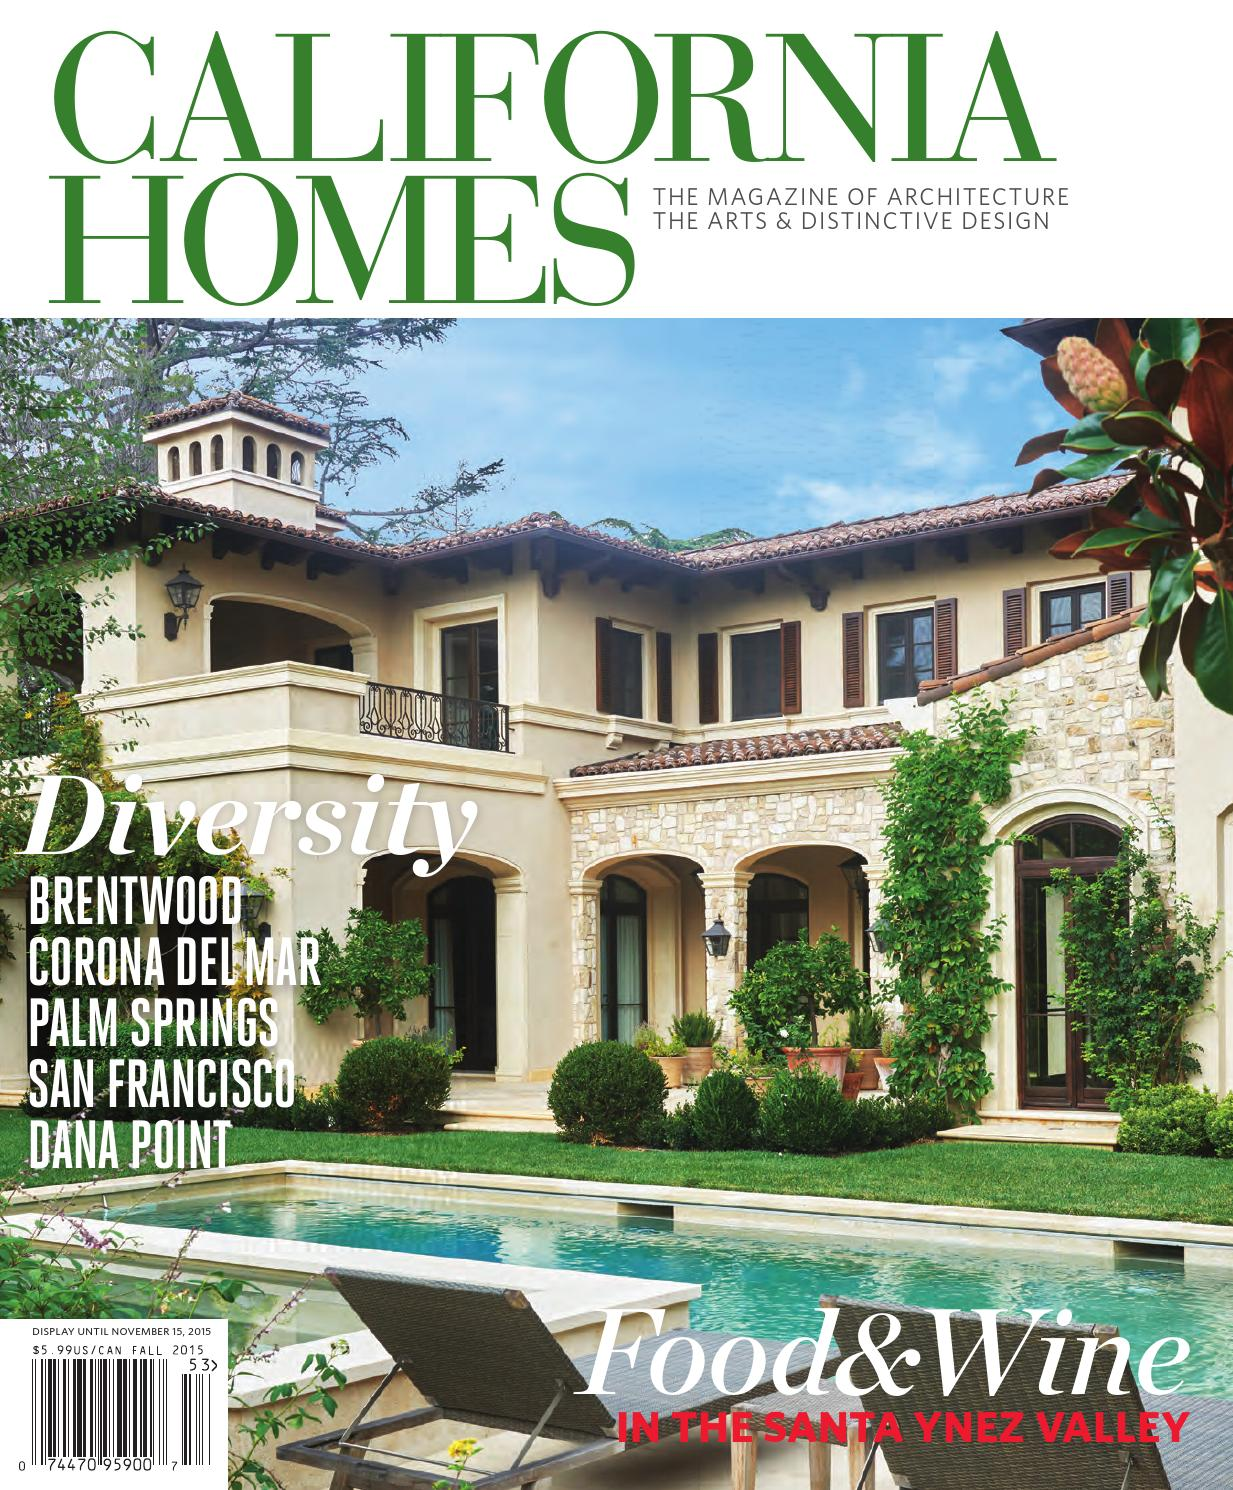 California Homes Fall 2015